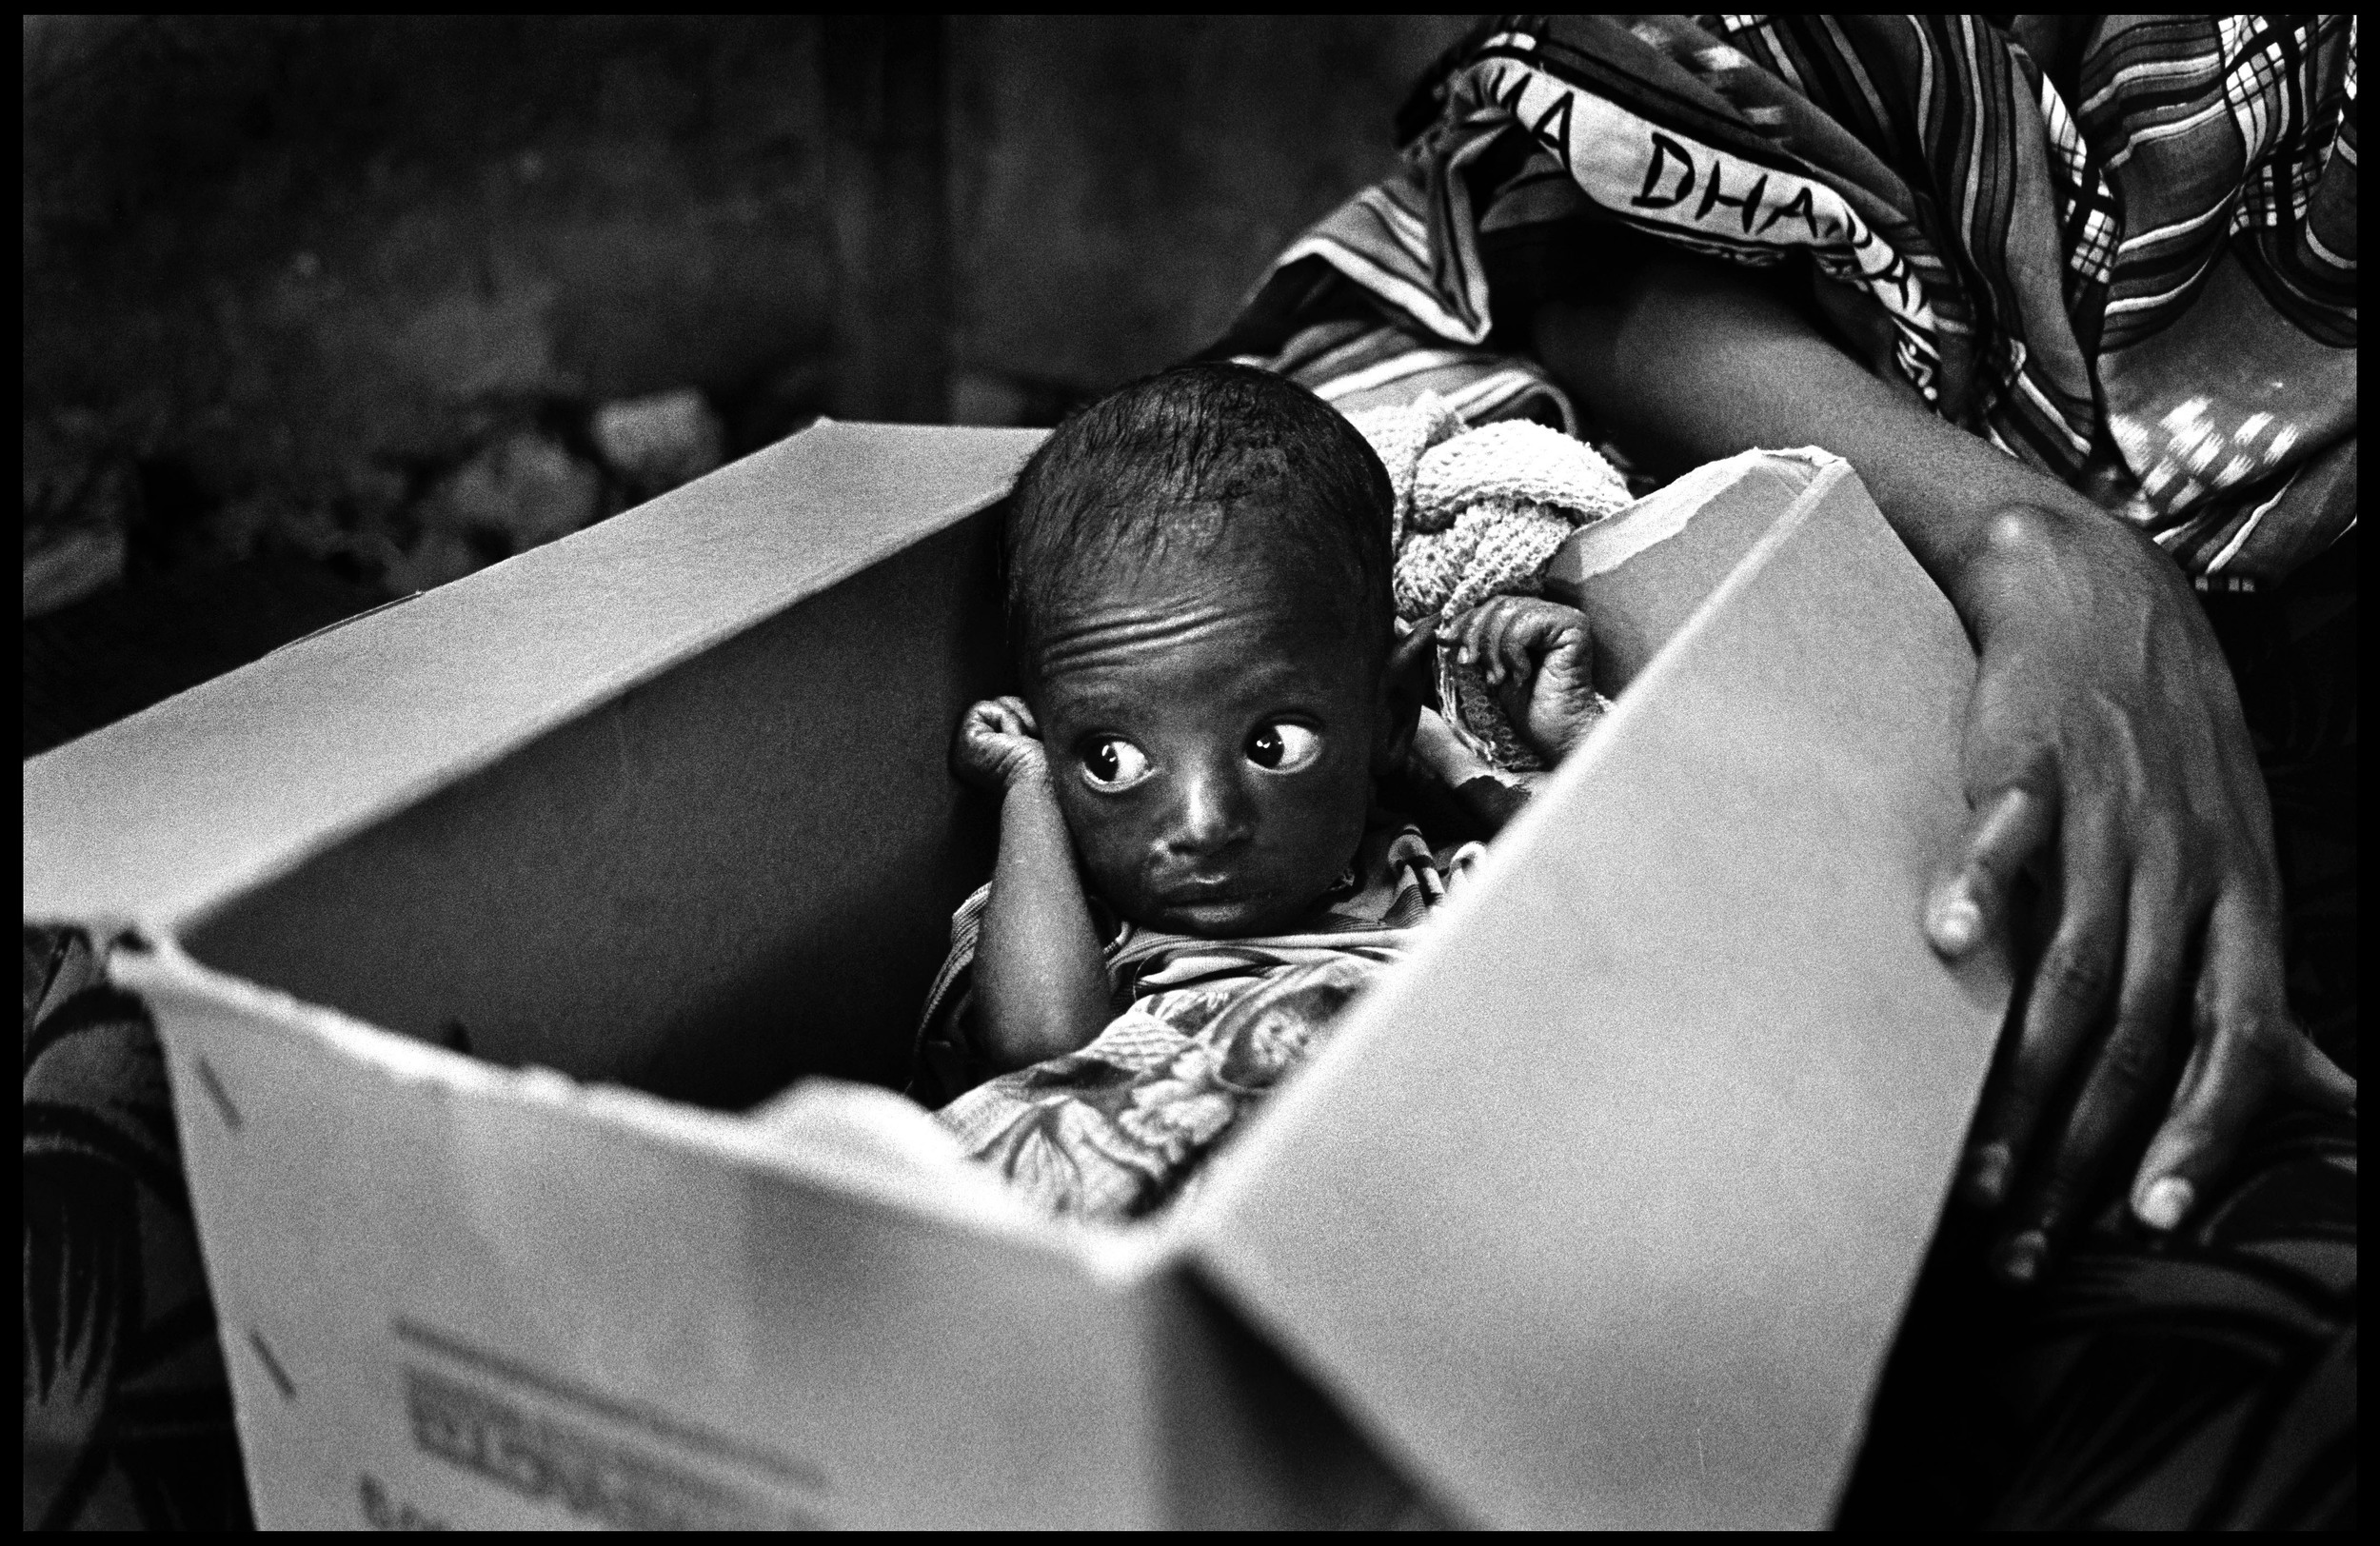 Abandoned in a box outside feeding programme, Mogadishu, Somalia